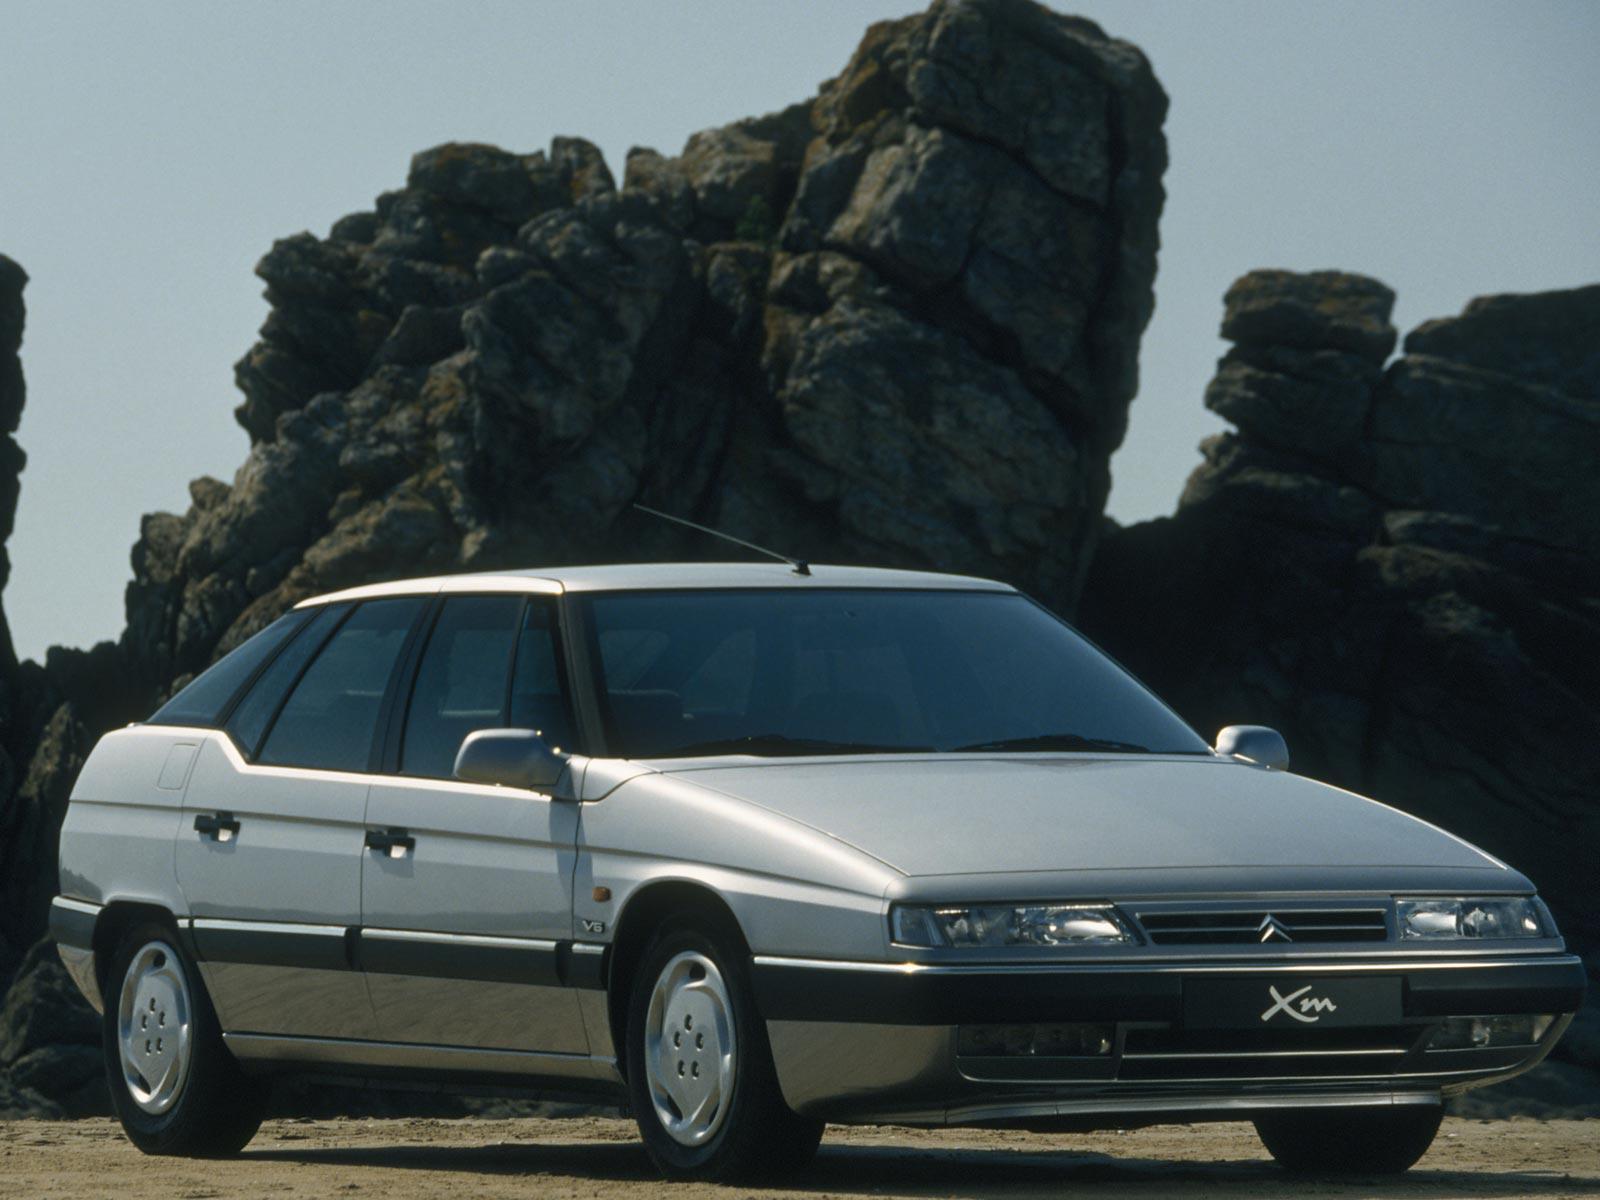 1989 2000 Citroen Xm Autoguru Katalog At